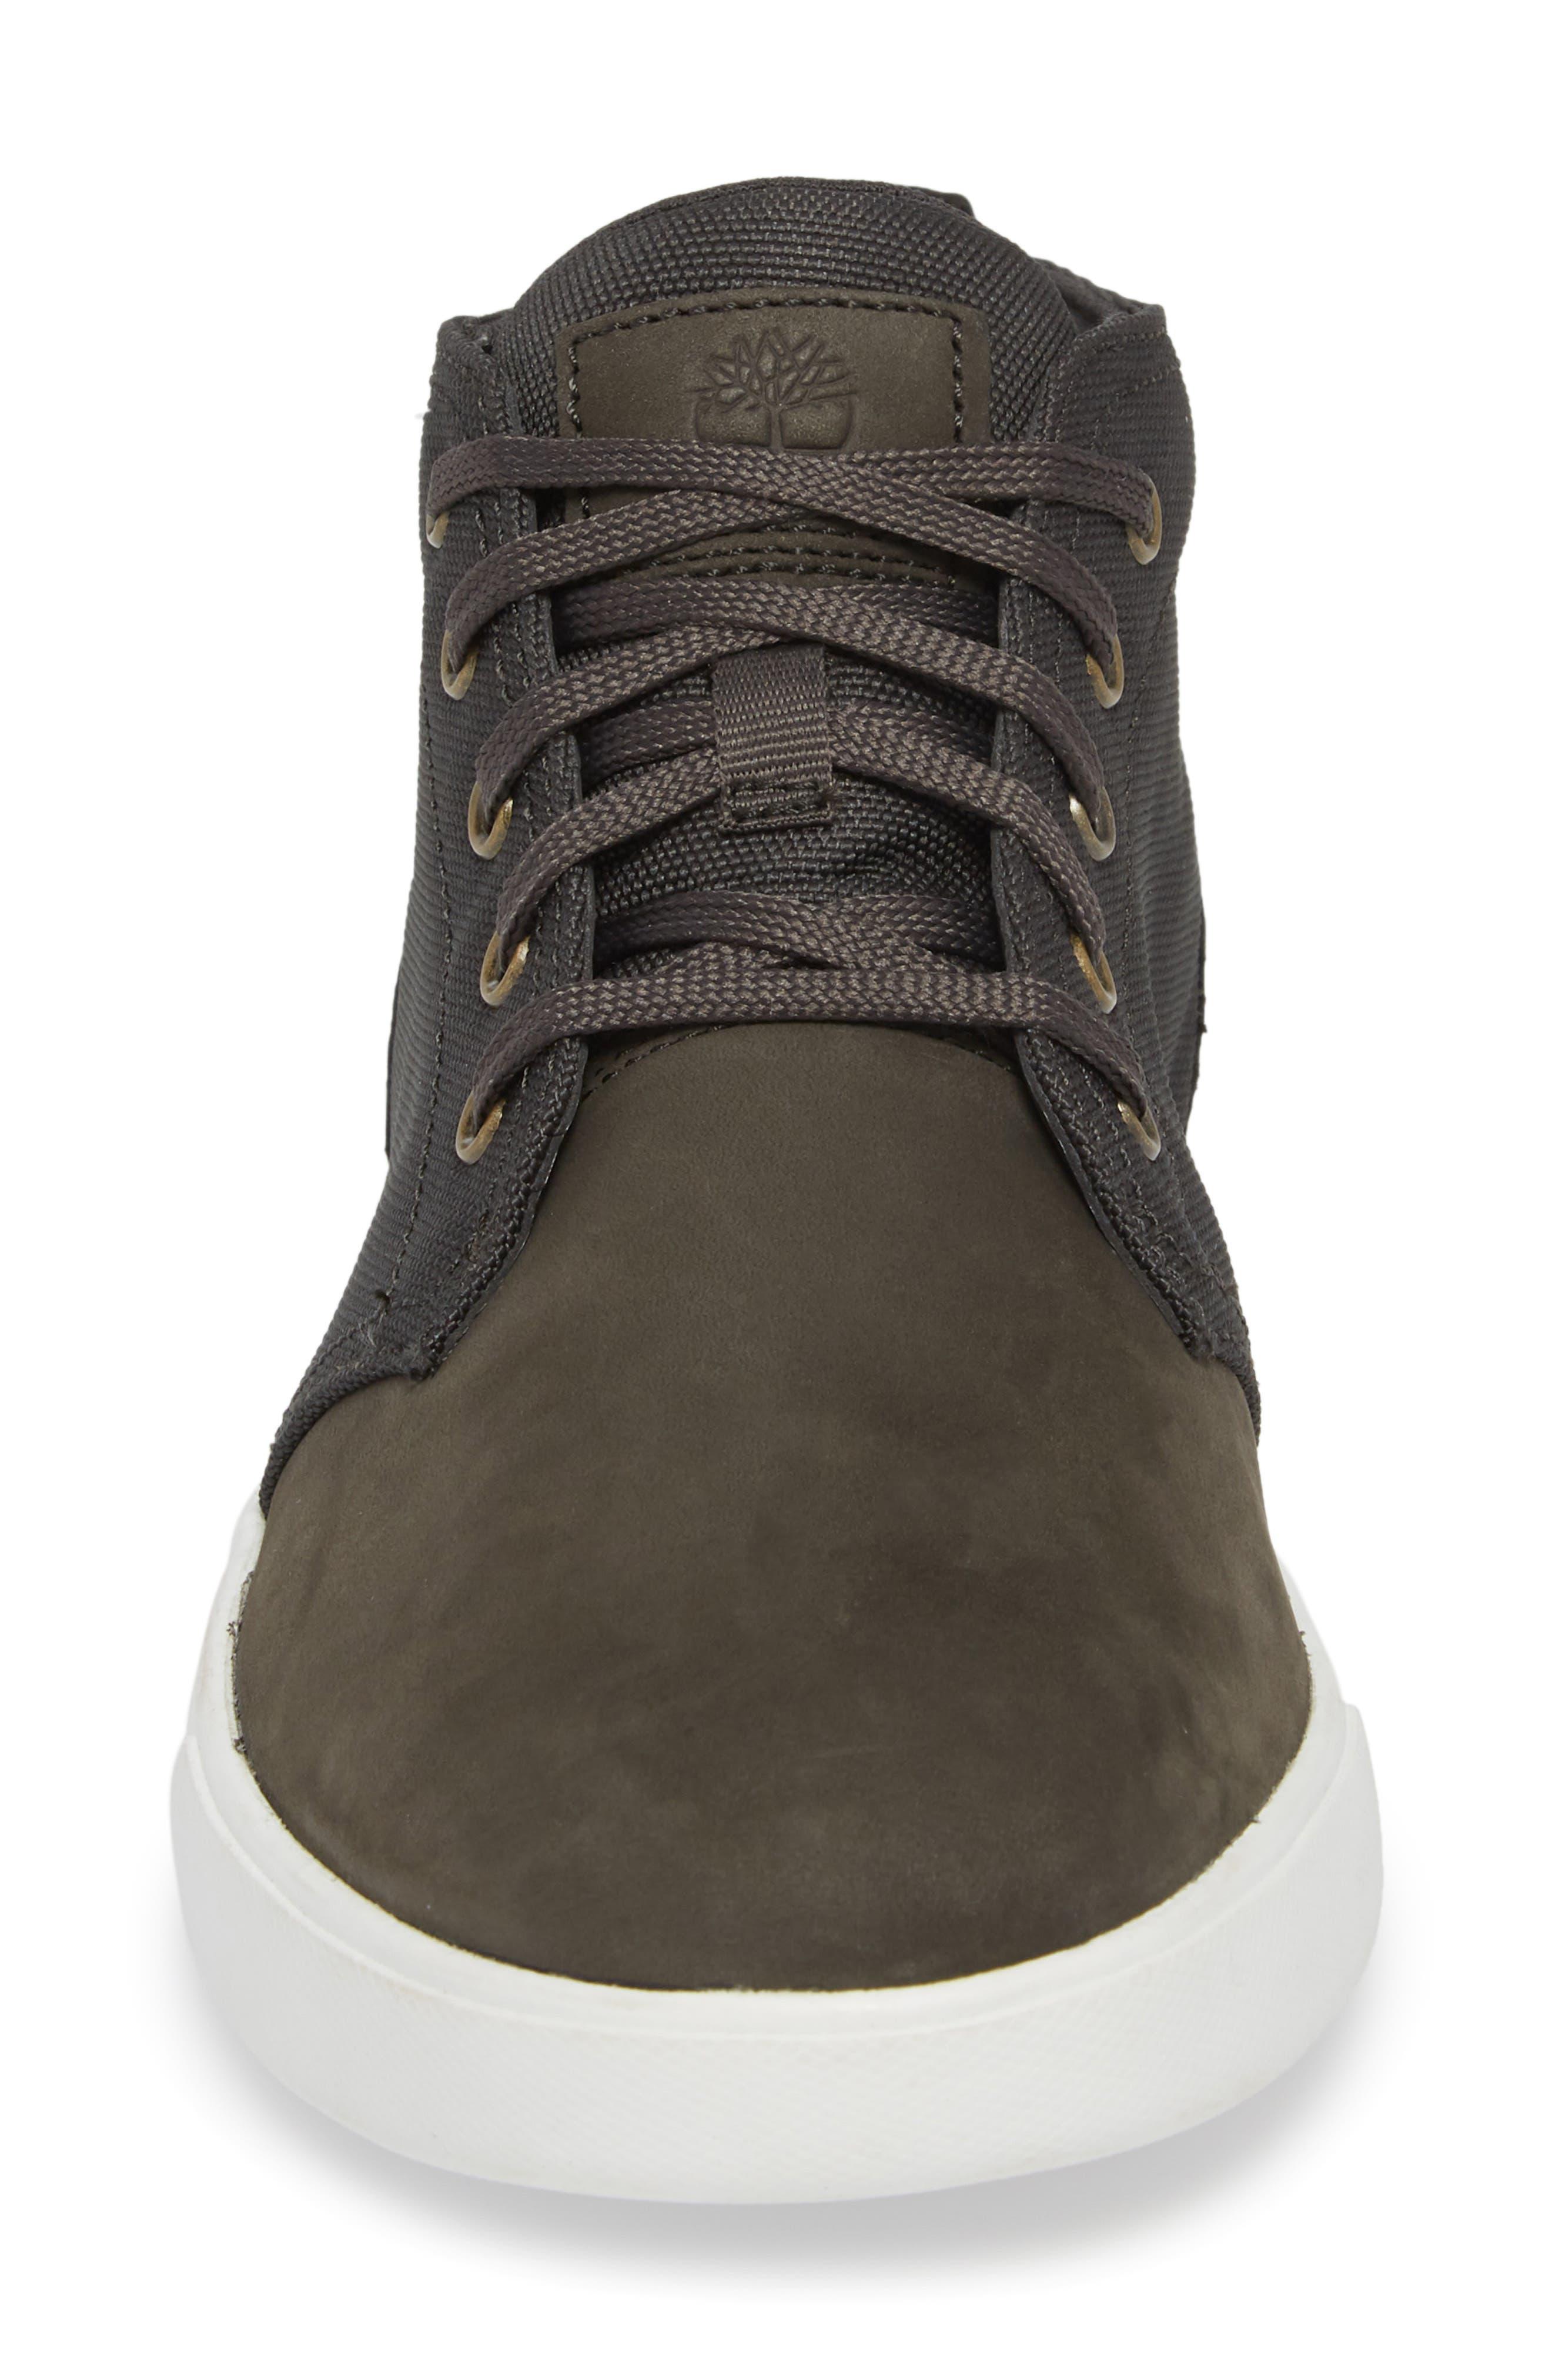 Earthkeepers<sup>™</sup> 'Groveton' Chukka Sneaker,                             Alternate thumbnail 4, color,                             DARK GREEN NUBUCK